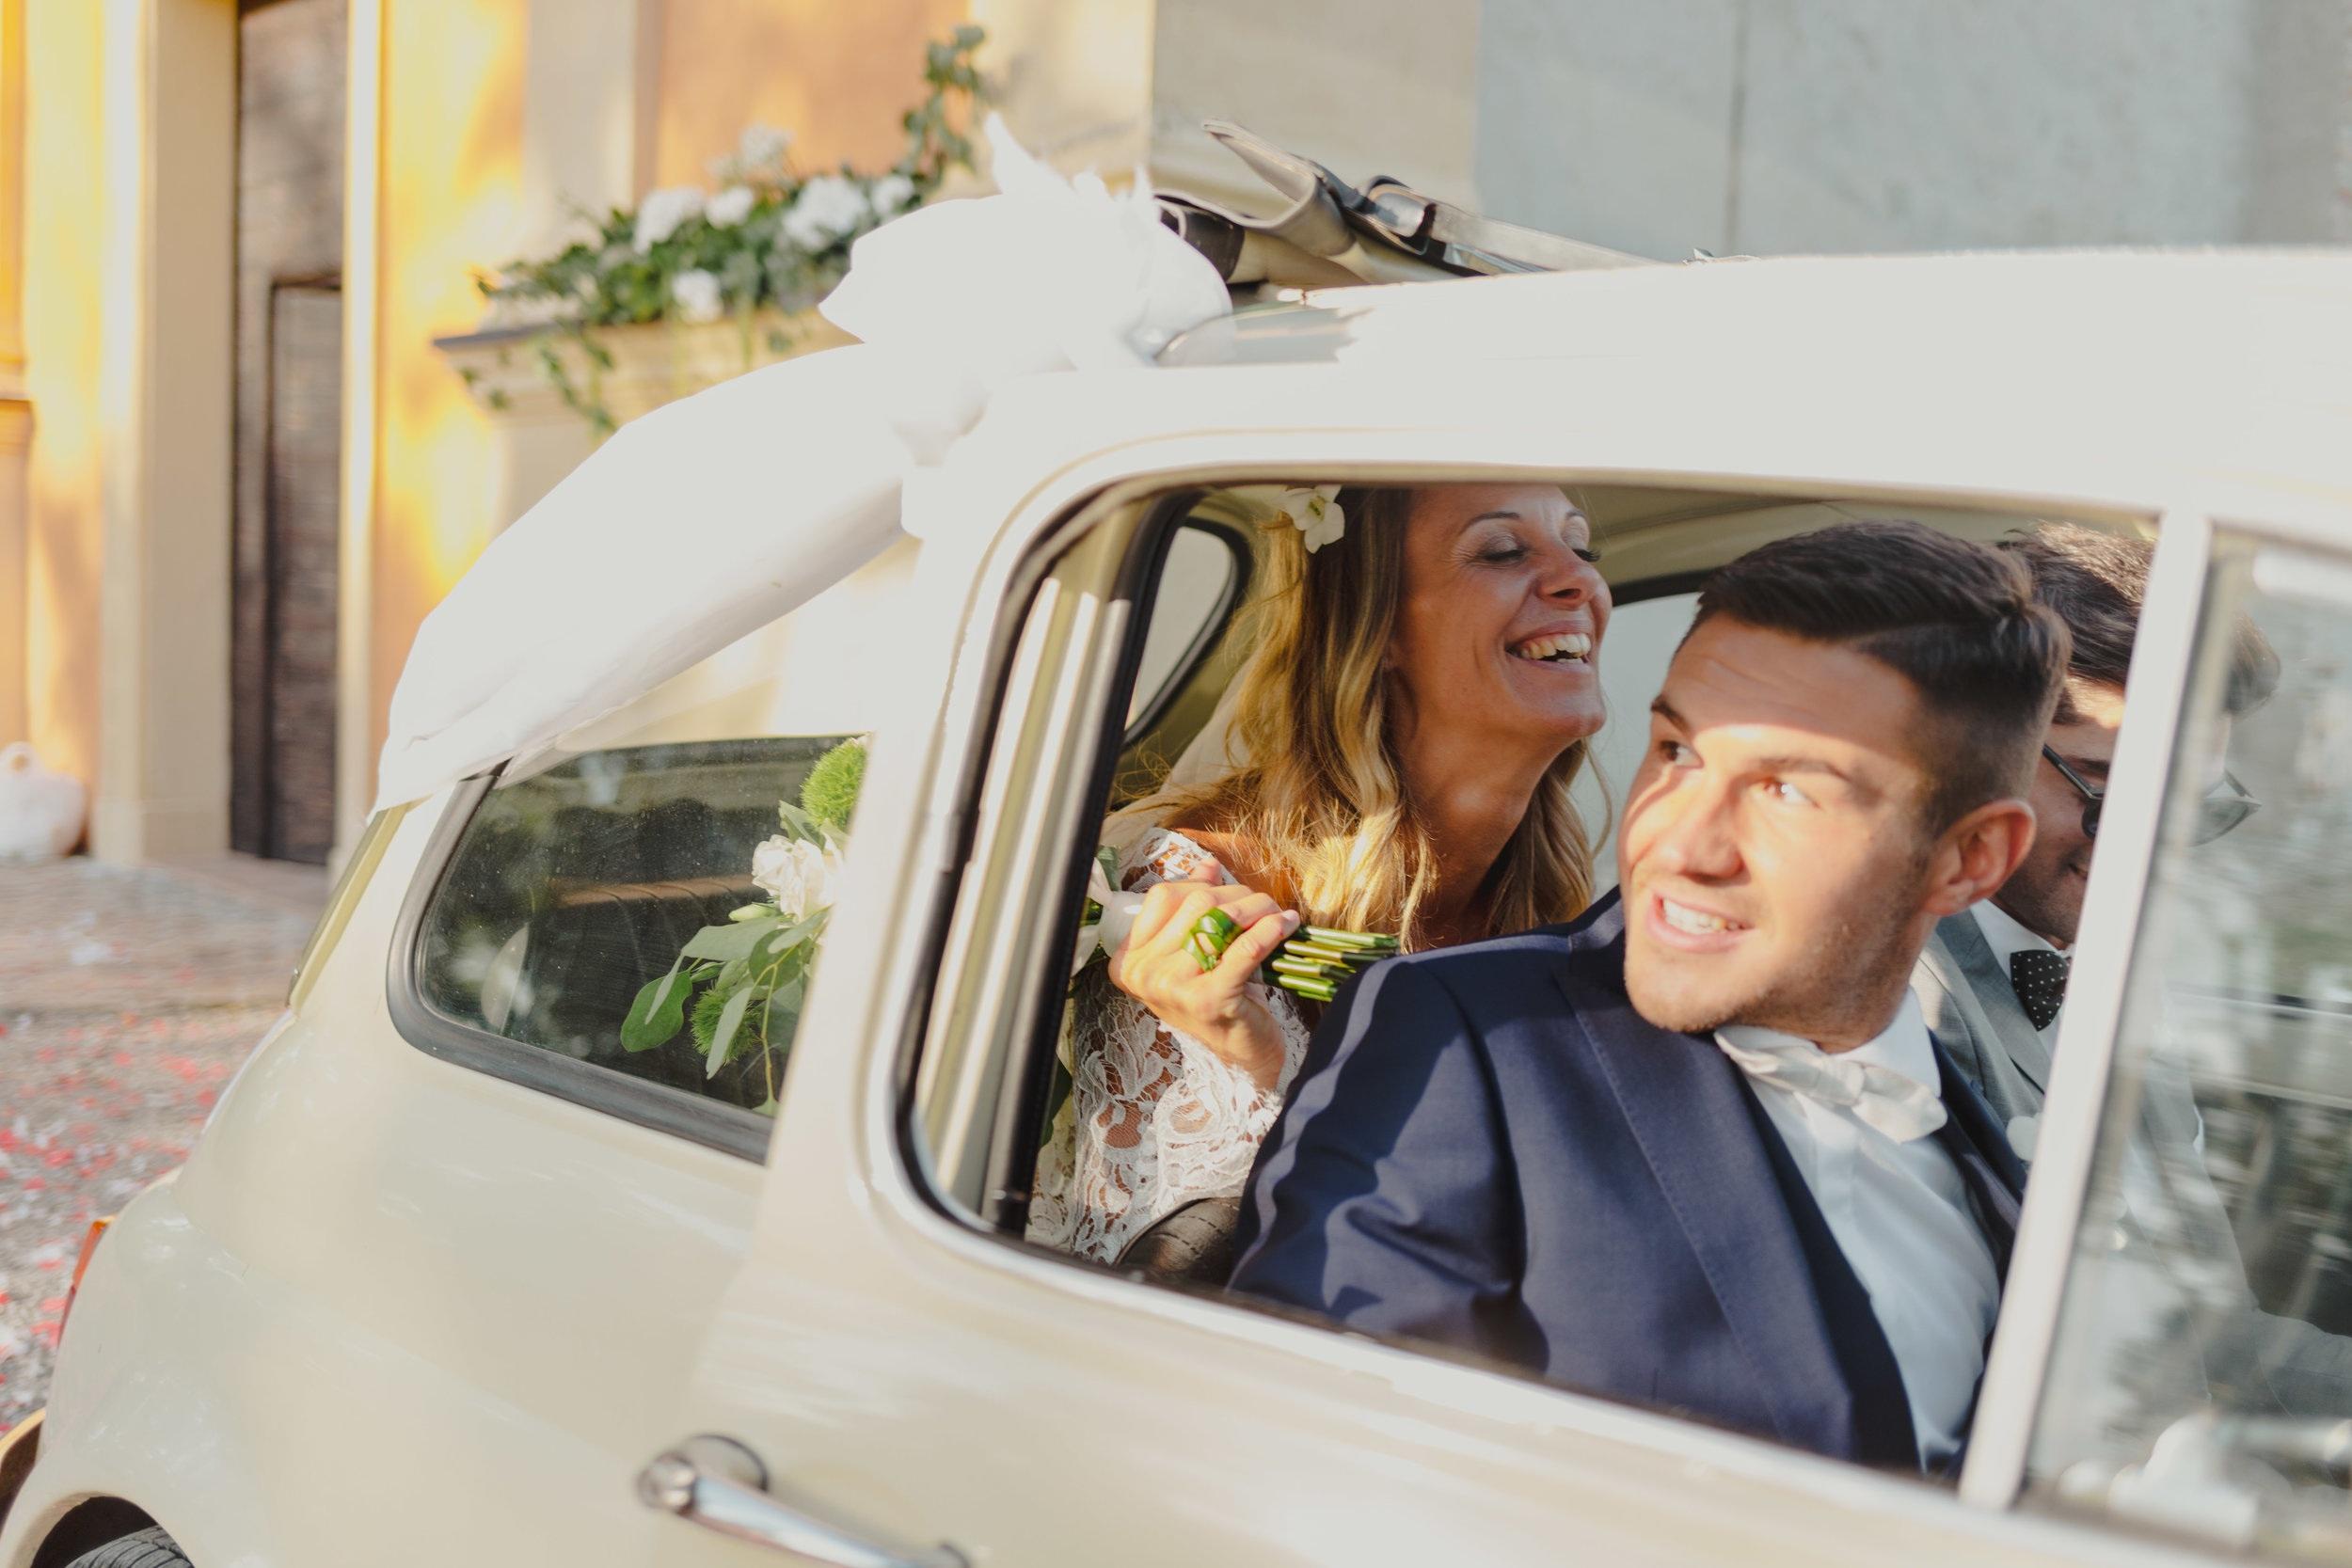 charlotte wedding photographer, destination wedding photographer, italian countryside wedding, milan wedding photographer,  north carolina wedding photographer,